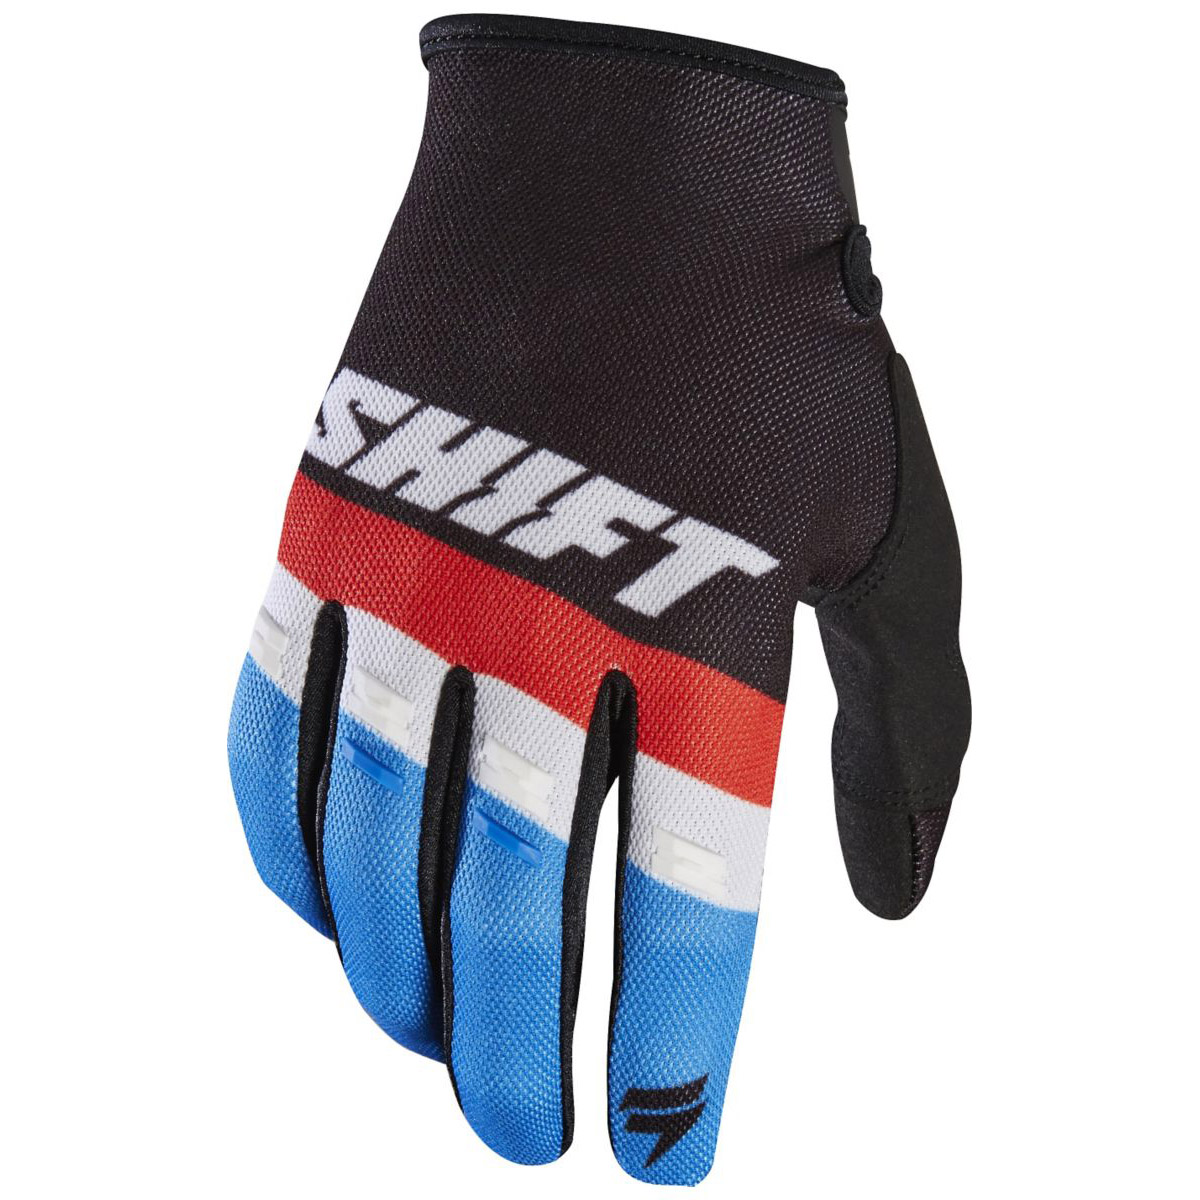 Shift - 2017 White Label Air перчатки, черные